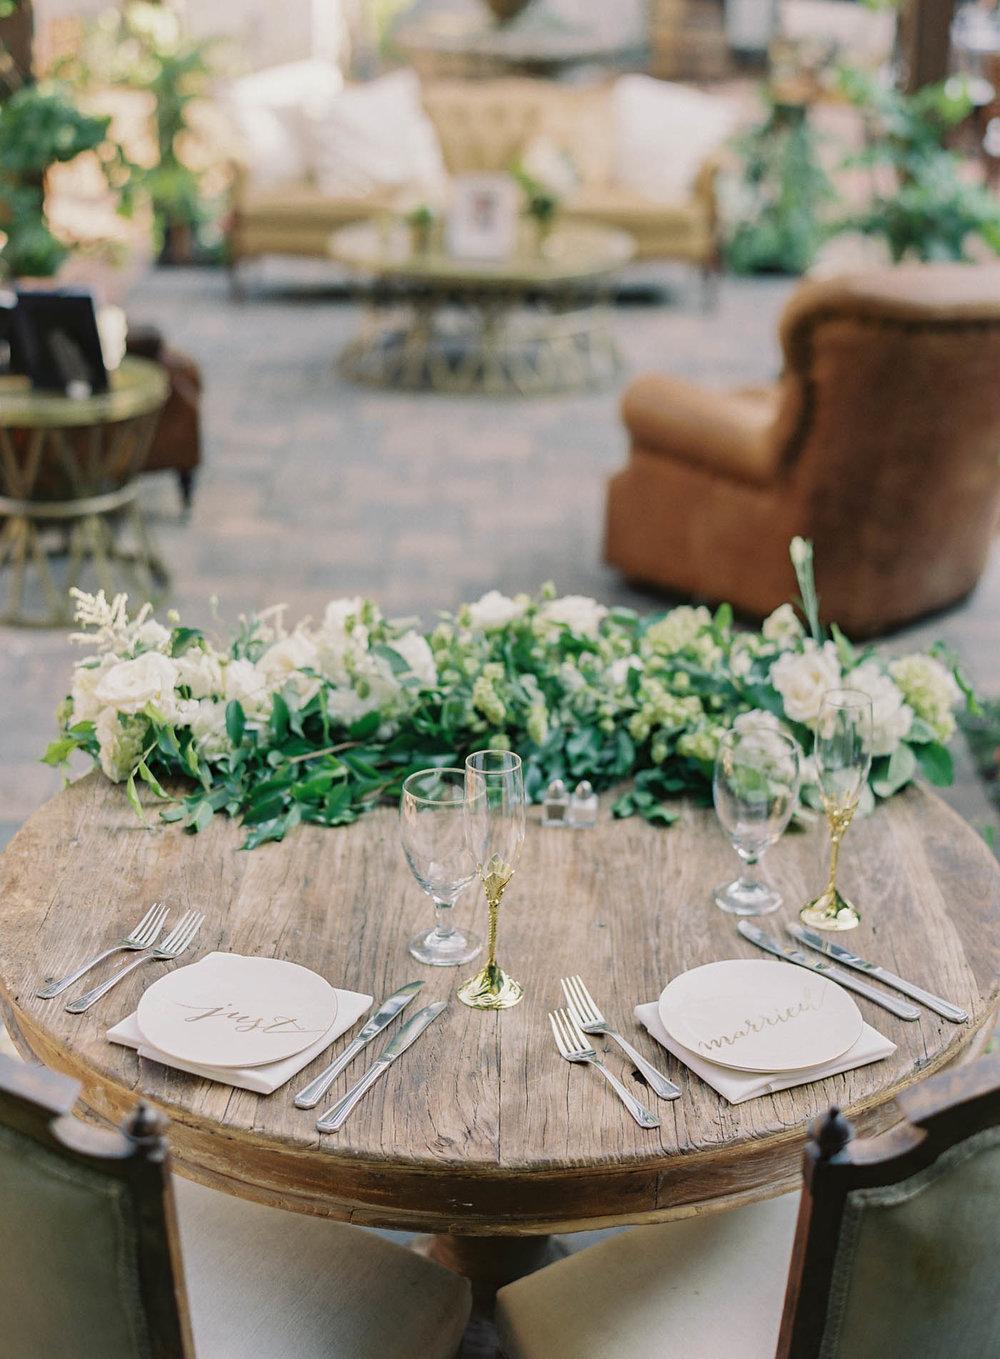 franciscan-gardens-wedding-21-Jen_Huang-000754-R1-007.jpg